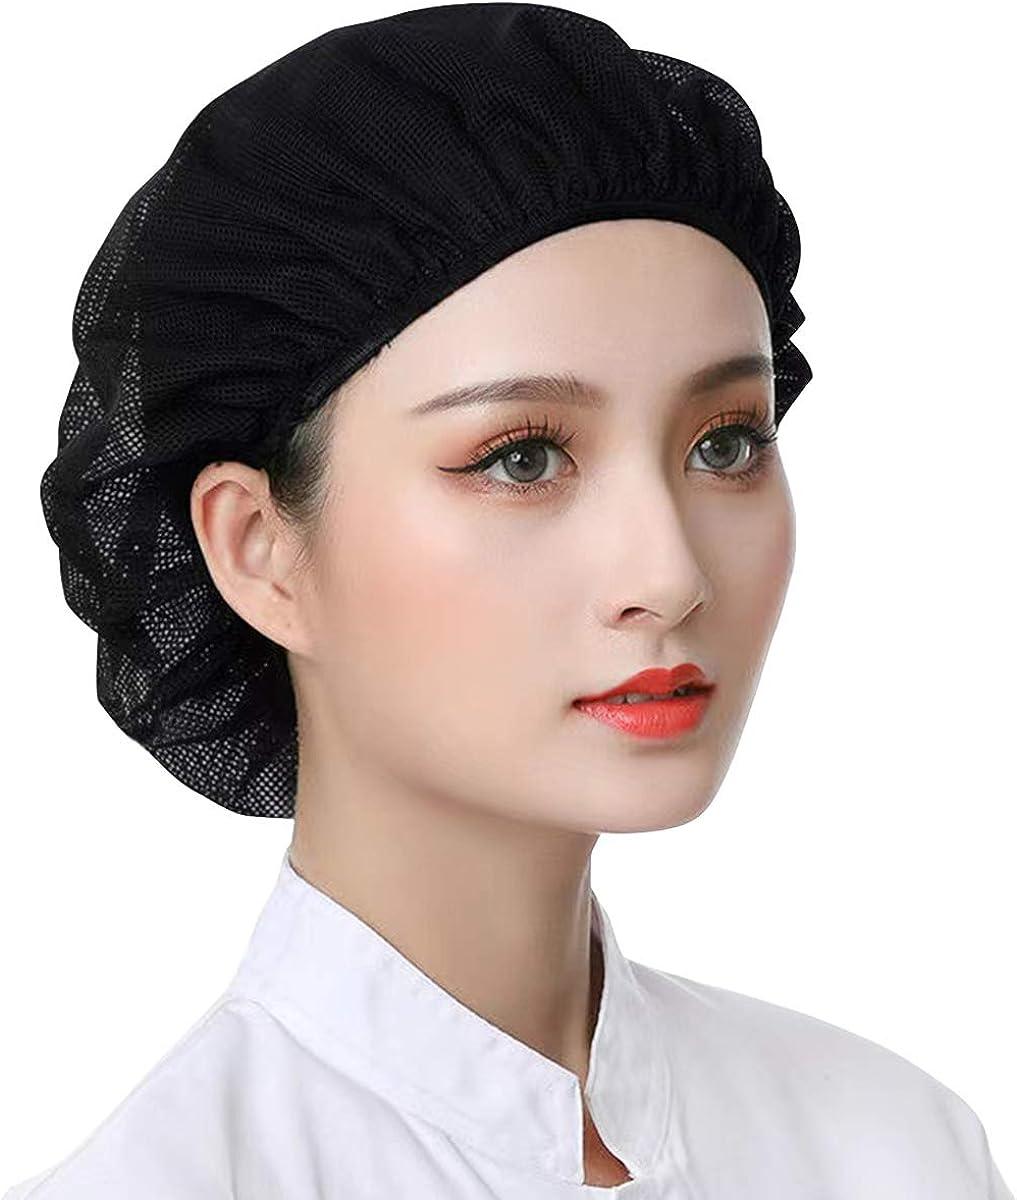 6pcs Unisex Elastic Chef Hat Kitchen Cooking Hat Food Service Hair Nets Adjustable Mesh Cap